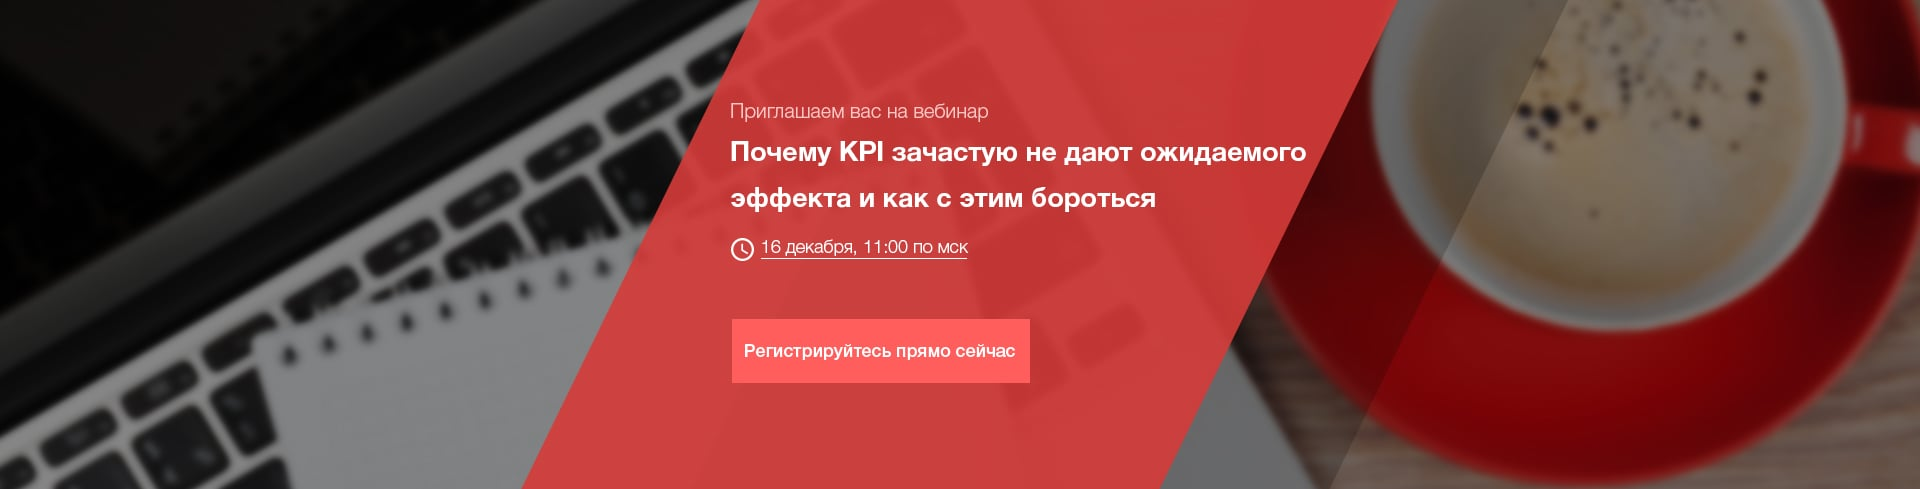 web_141216_kpi